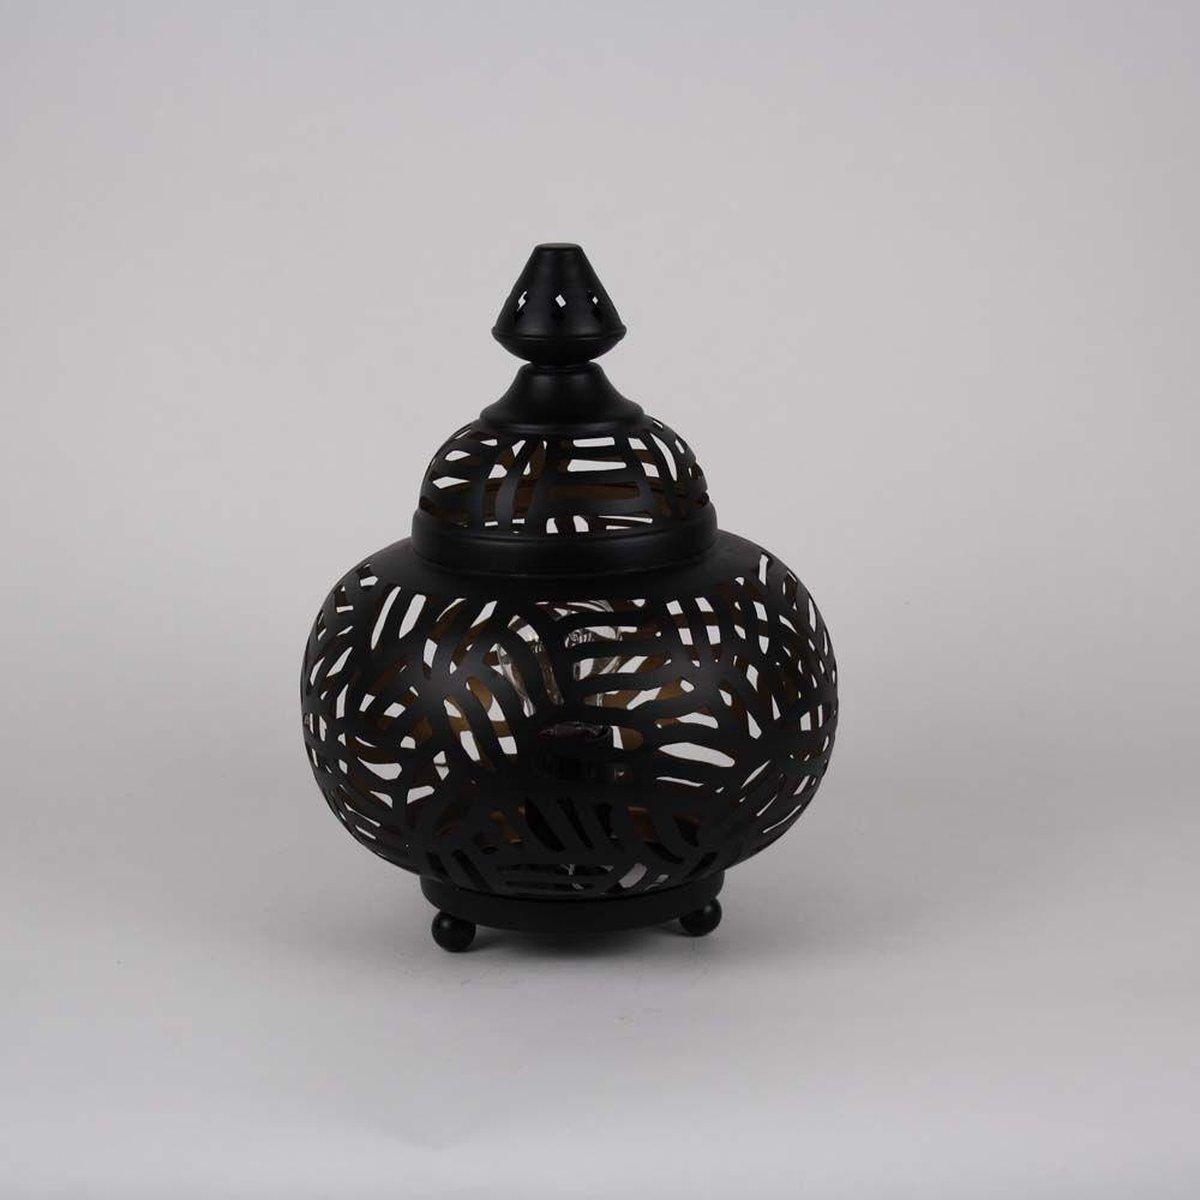 Arabische Tafellamp Zebra Almyra Zwart Goud Ø 23 x 31cm